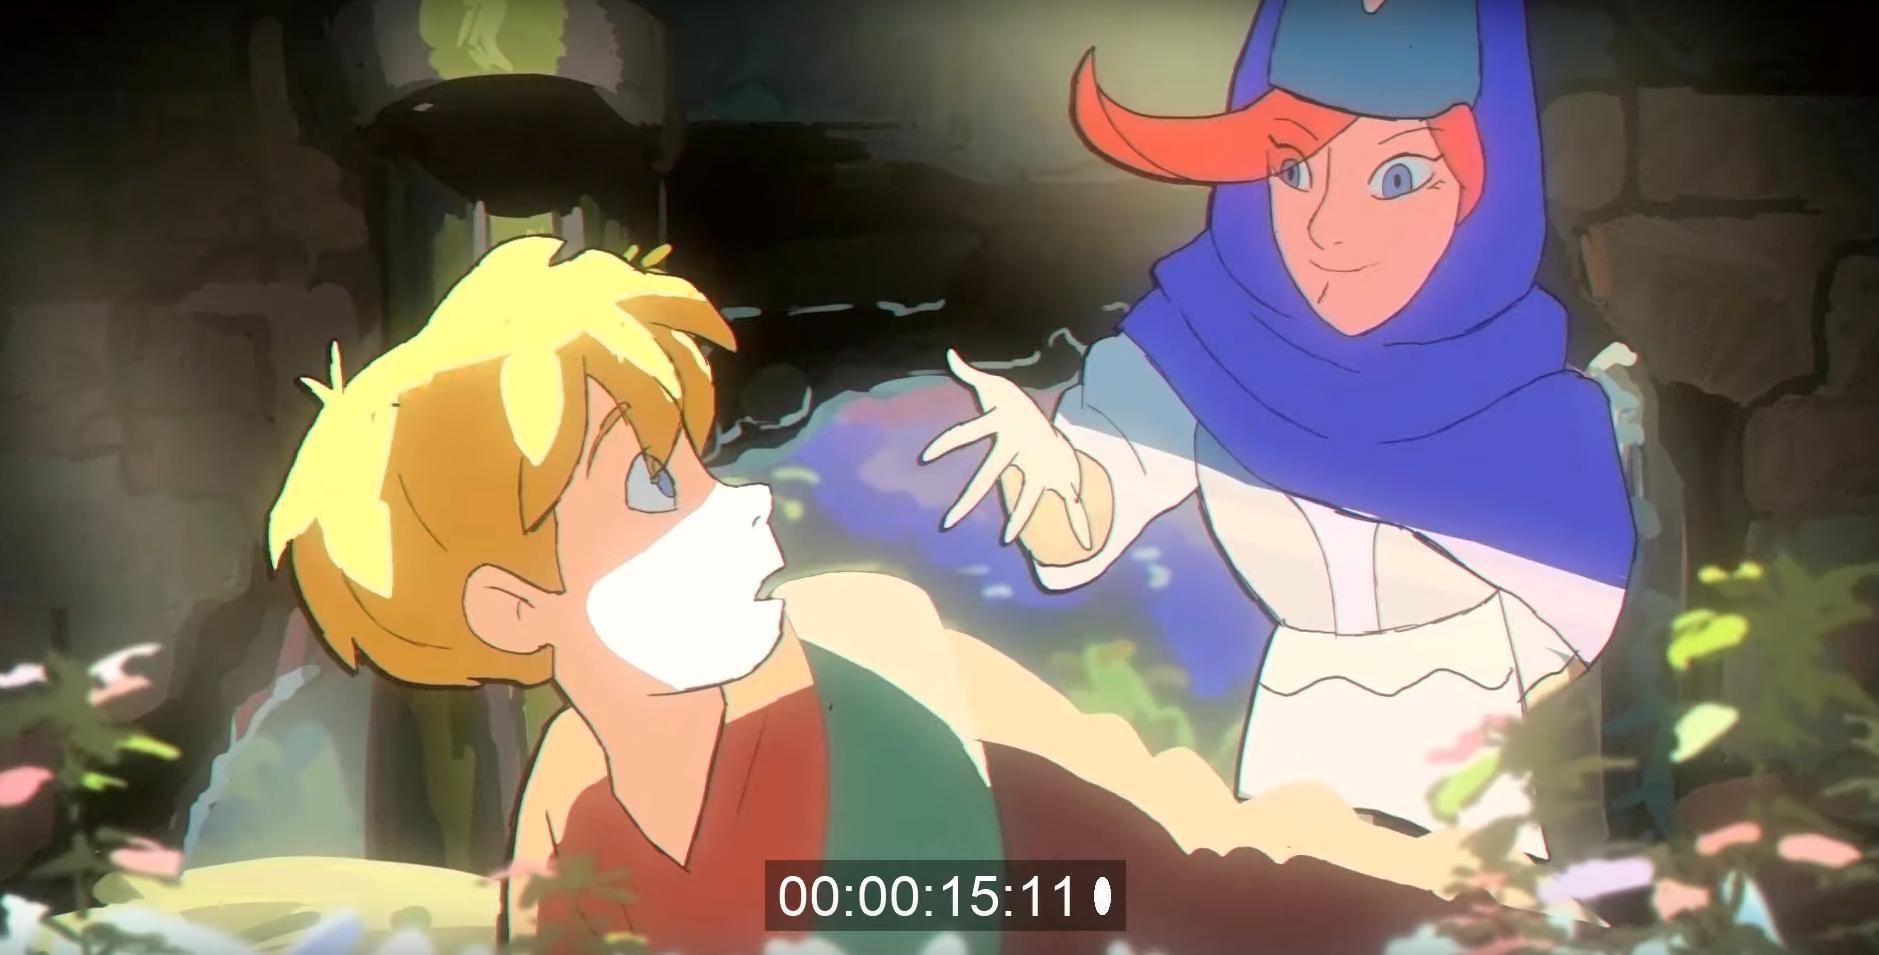 Короткометражка: Dream Bandits — трейлер фэнтези мультсериала в духе 90-х 1